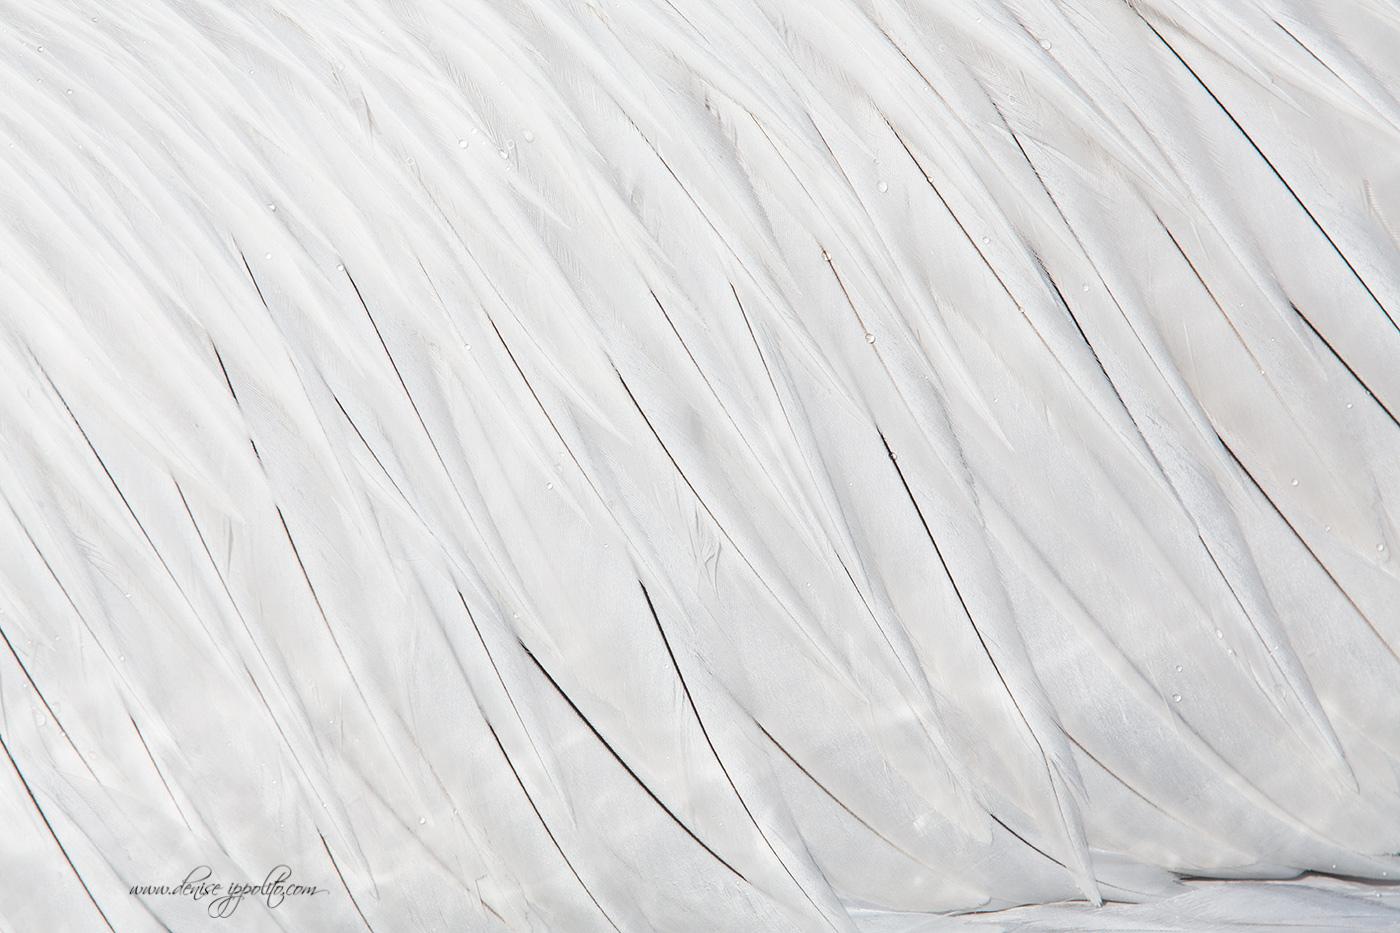 Dalmatian Pelican, Greece , 2016